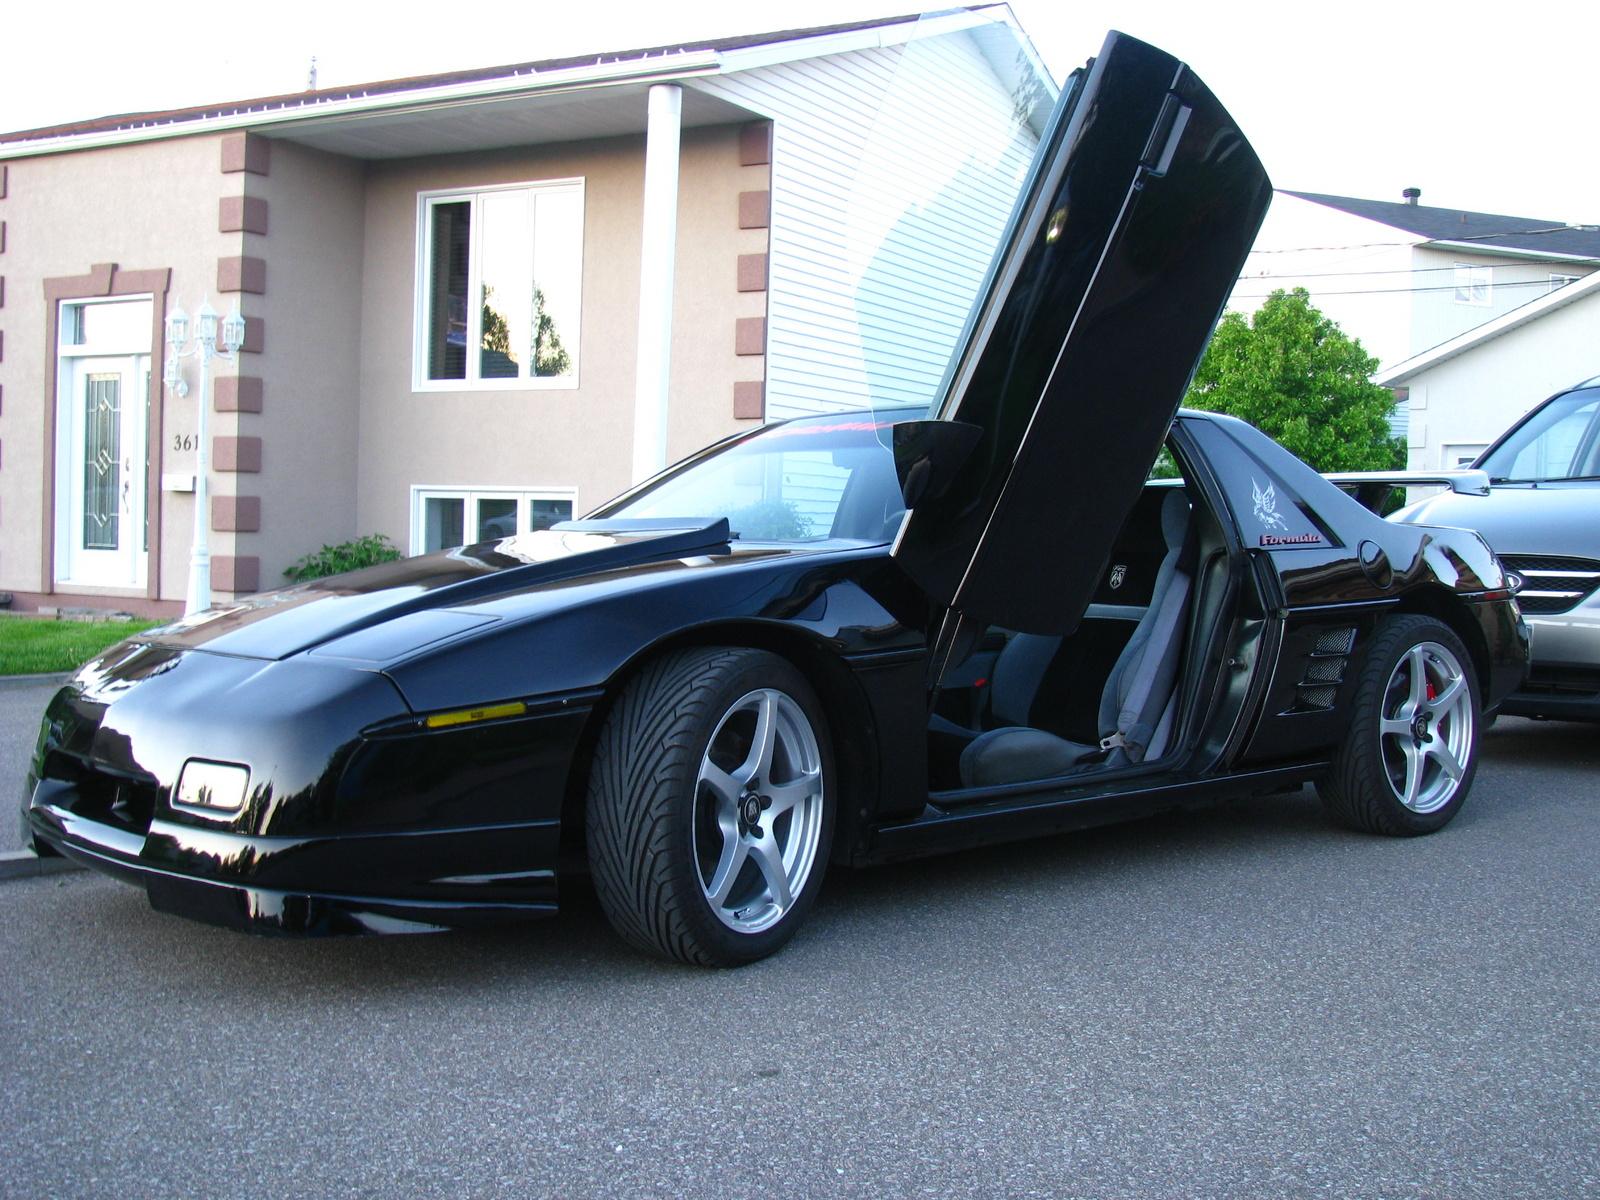 1988 Pontiac Fiero picture